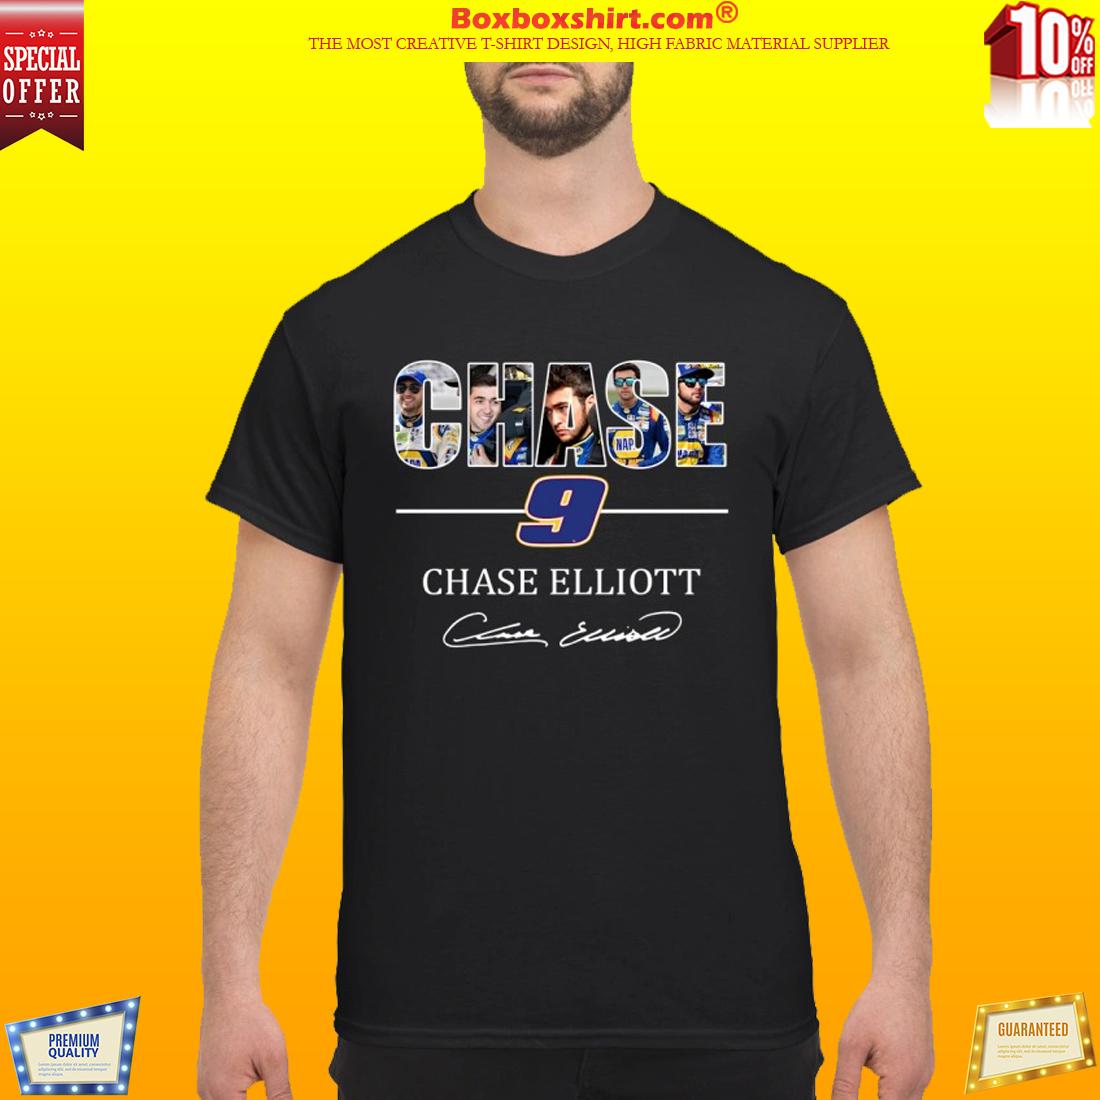 Chase Elliott T Shirt >> Limited Chase Elliott Signature Shirt